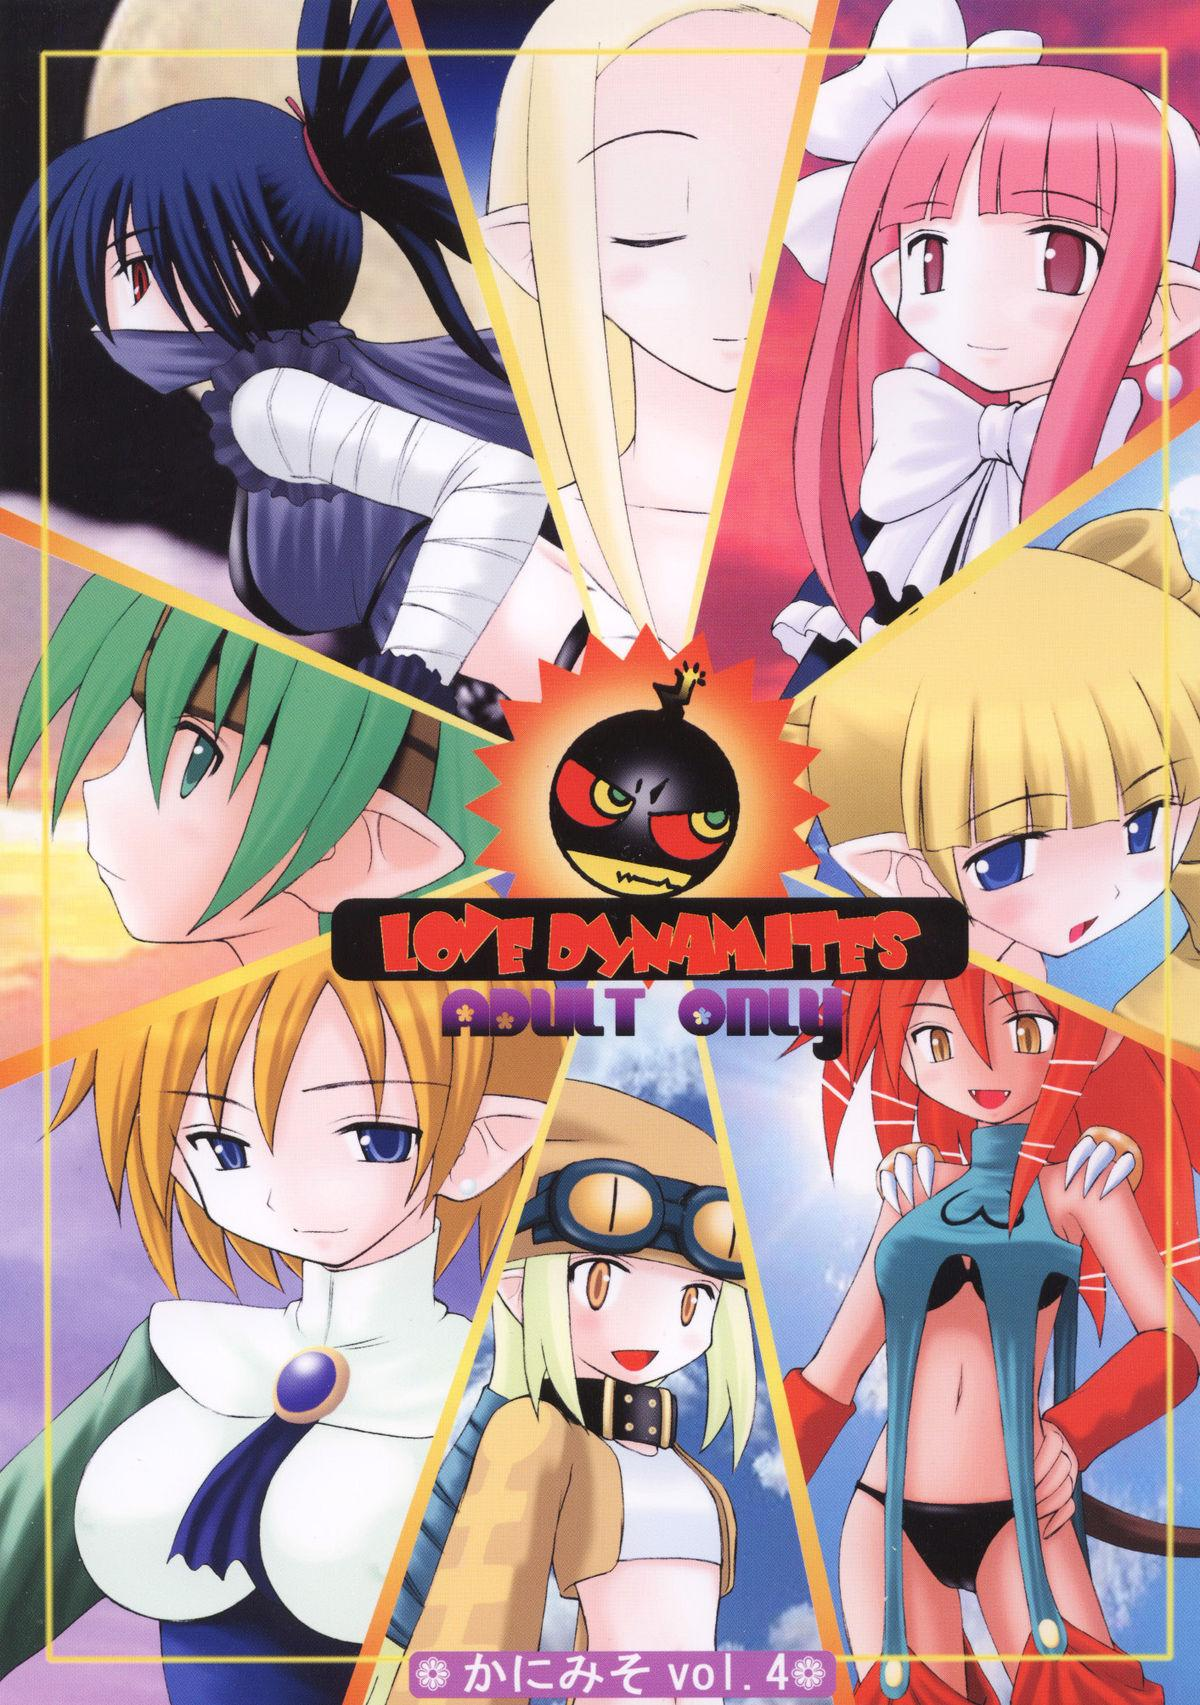 Kanimiso Vol. 4 - Love Dynamites 0